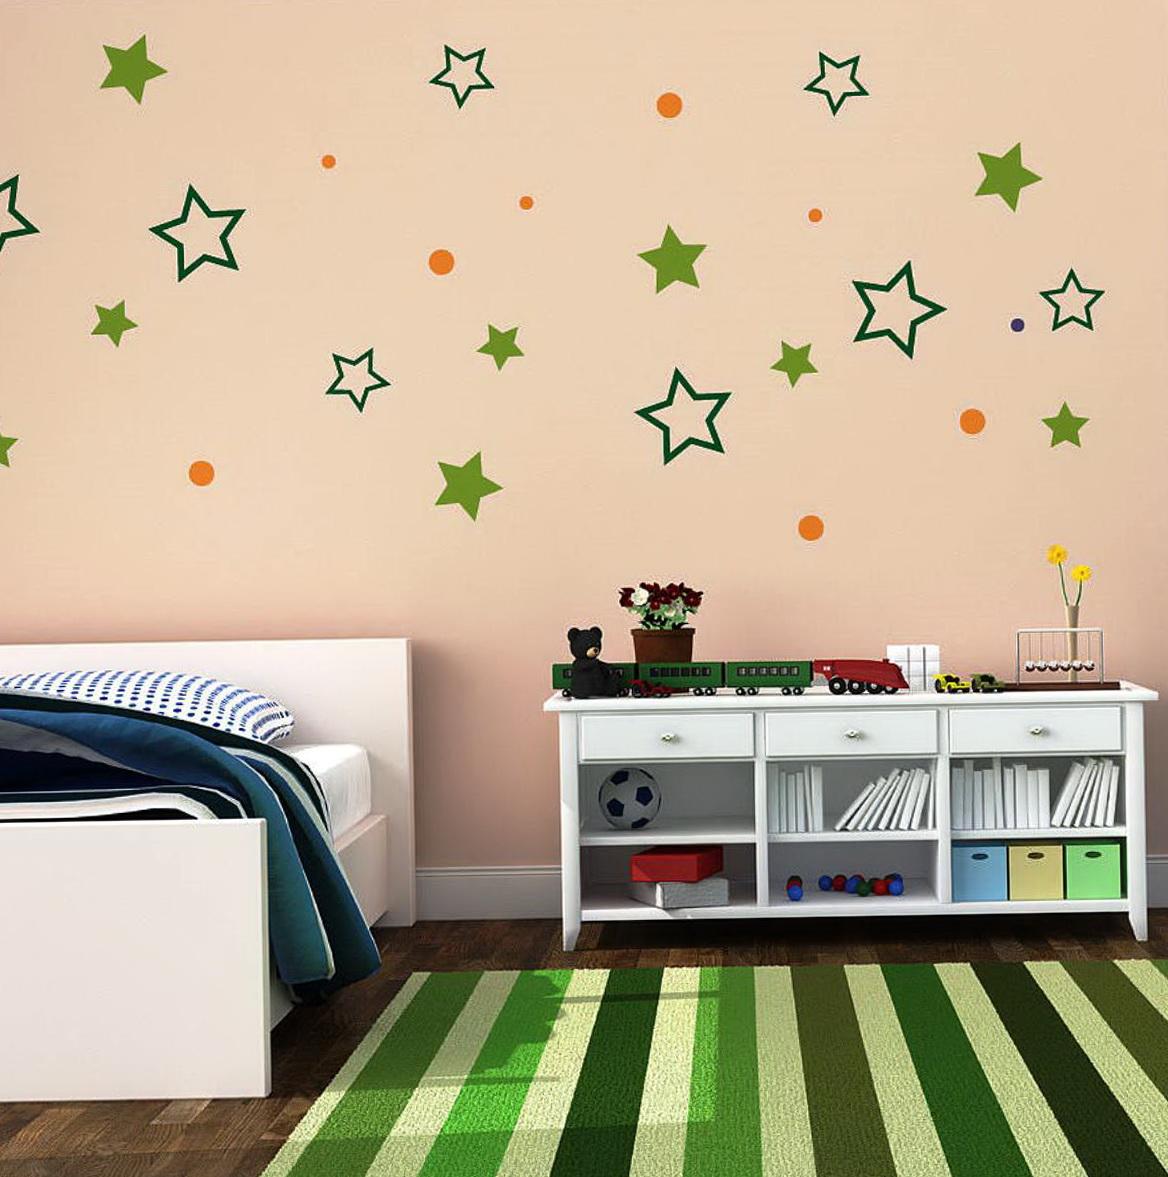 Wall Art For Bedroom Diy